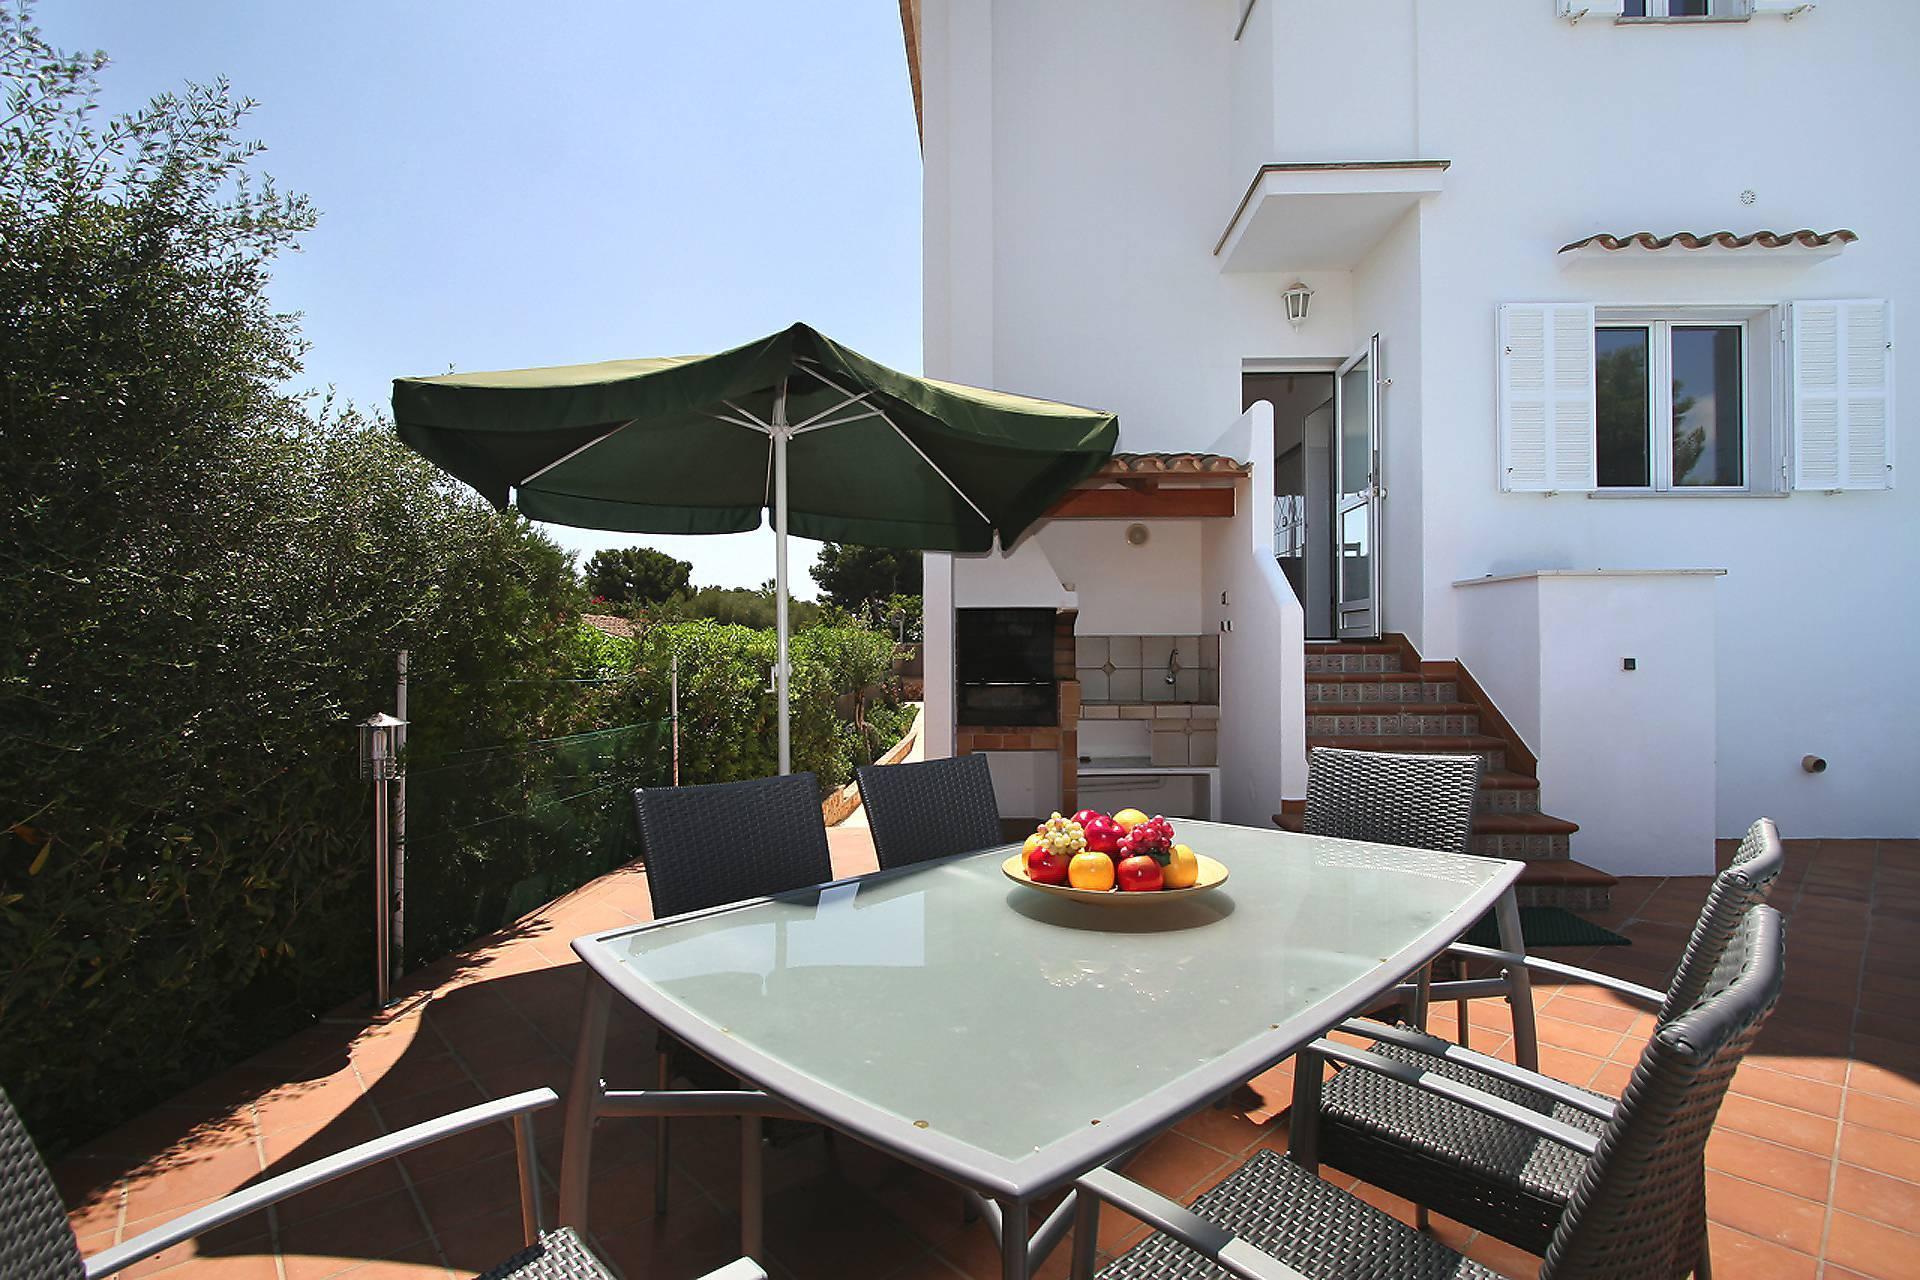 01-128 Rustic holiday home Majorca East Bild 7